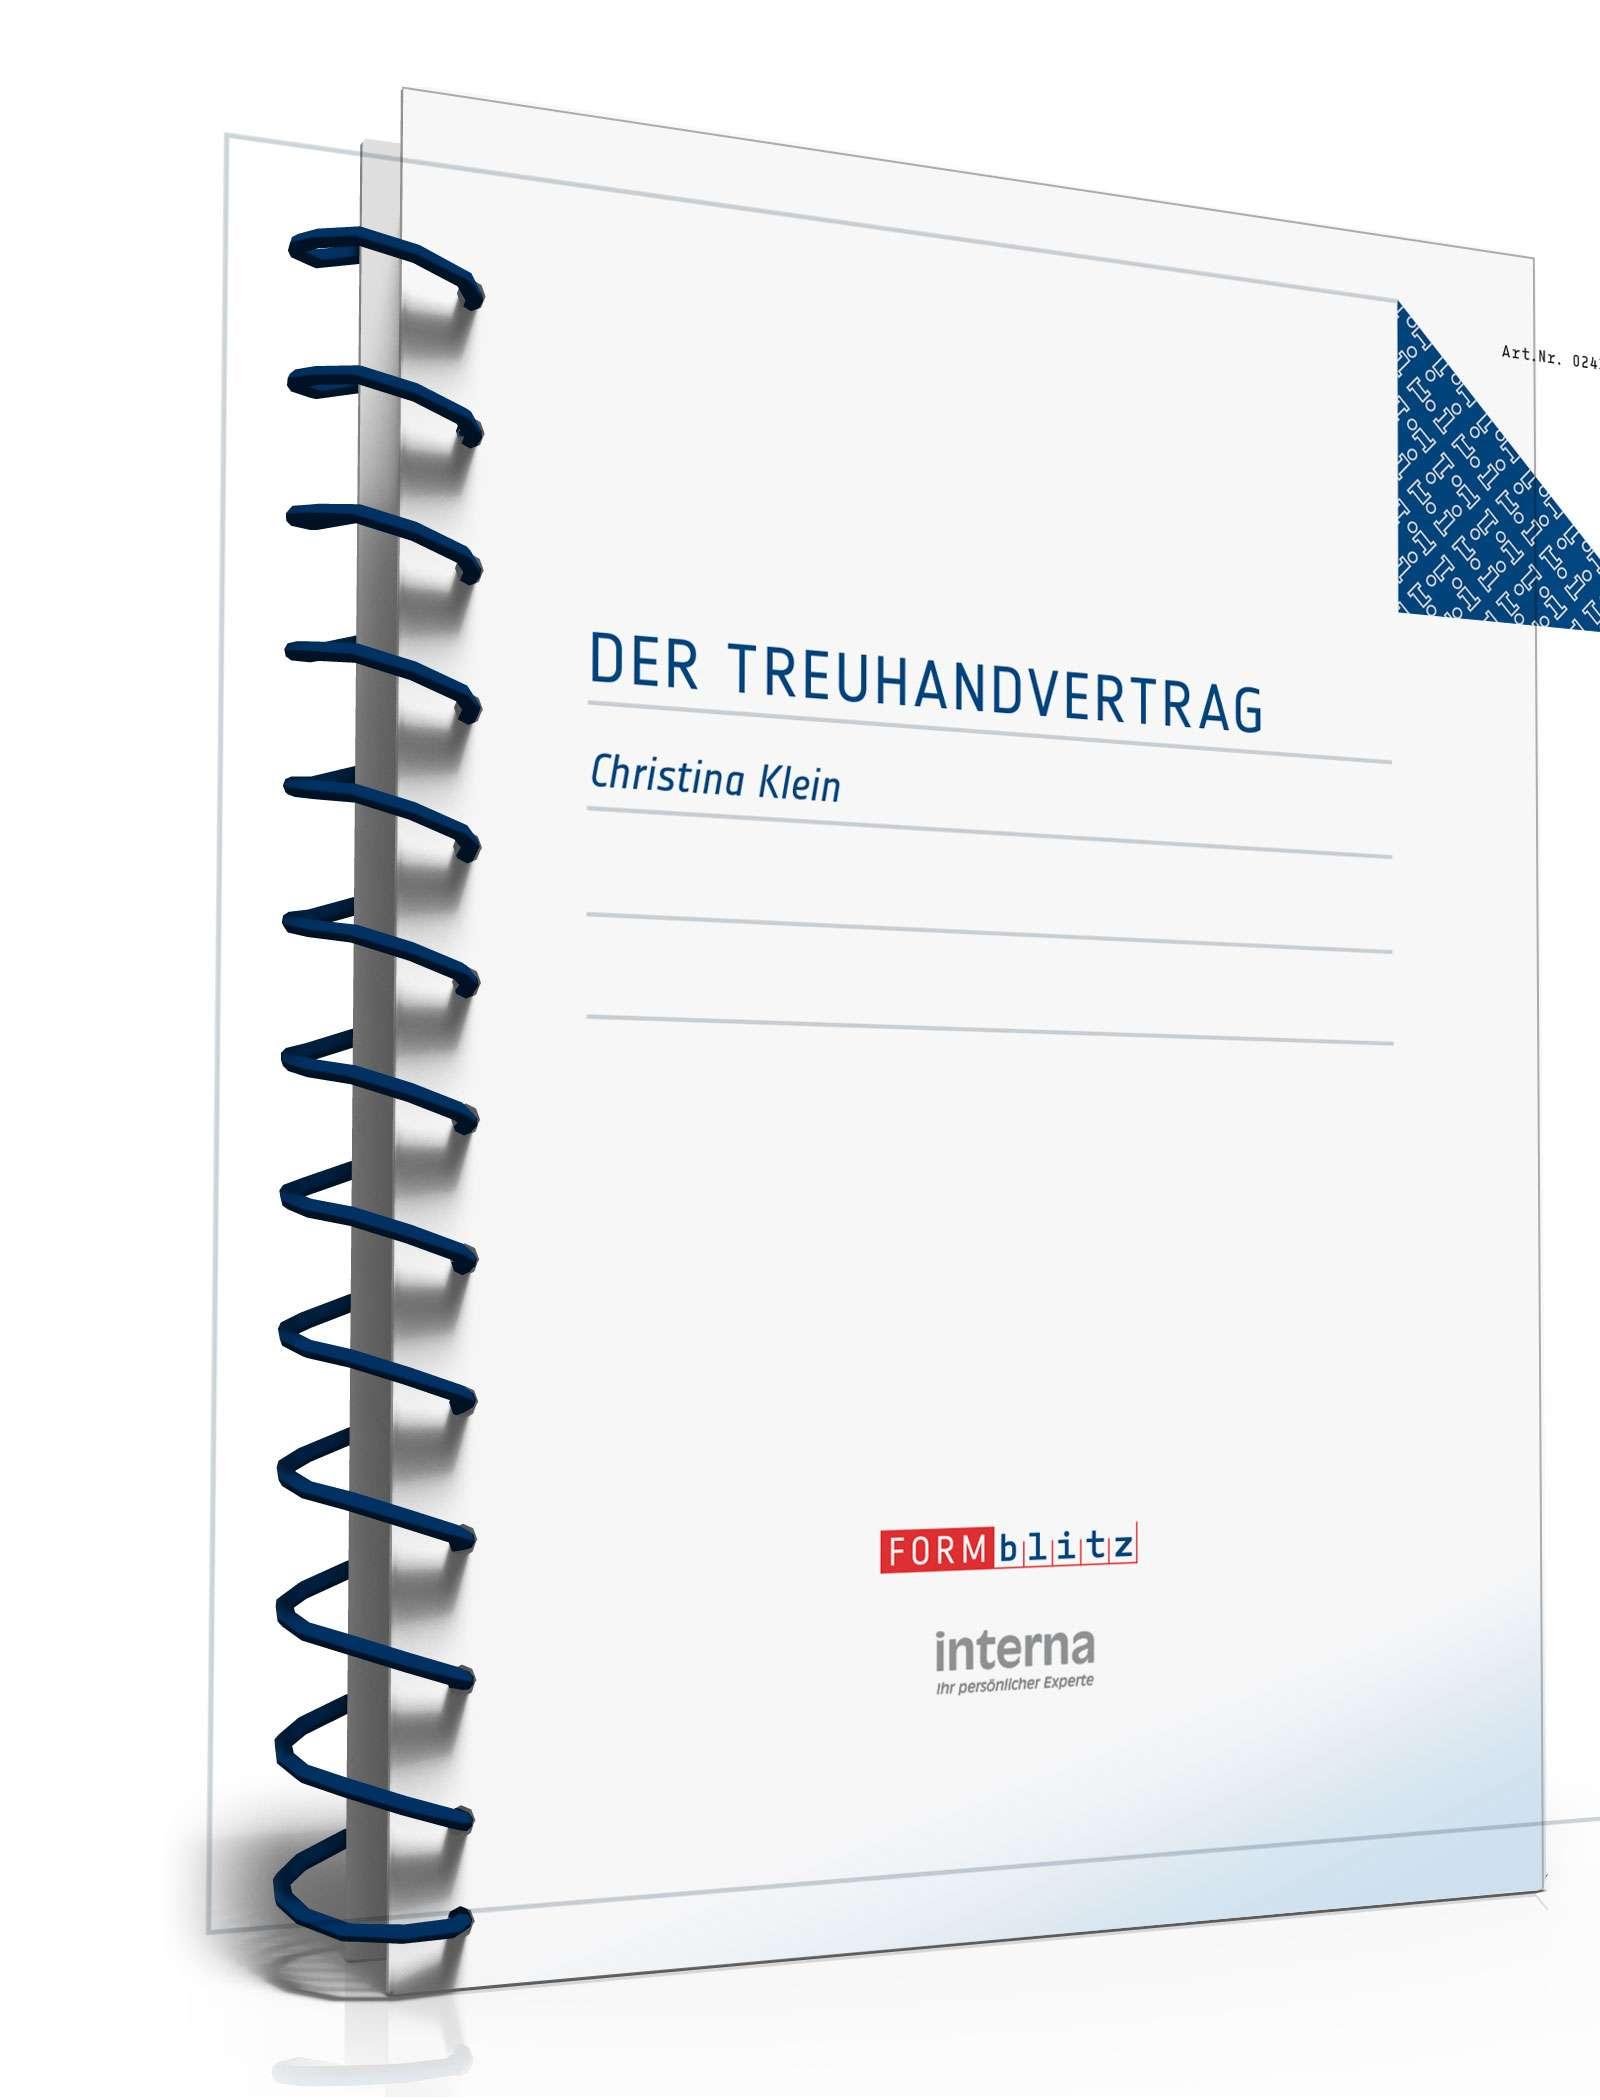 treuhandvertrag ratgeber zum download - Treuhandvertrag Muster